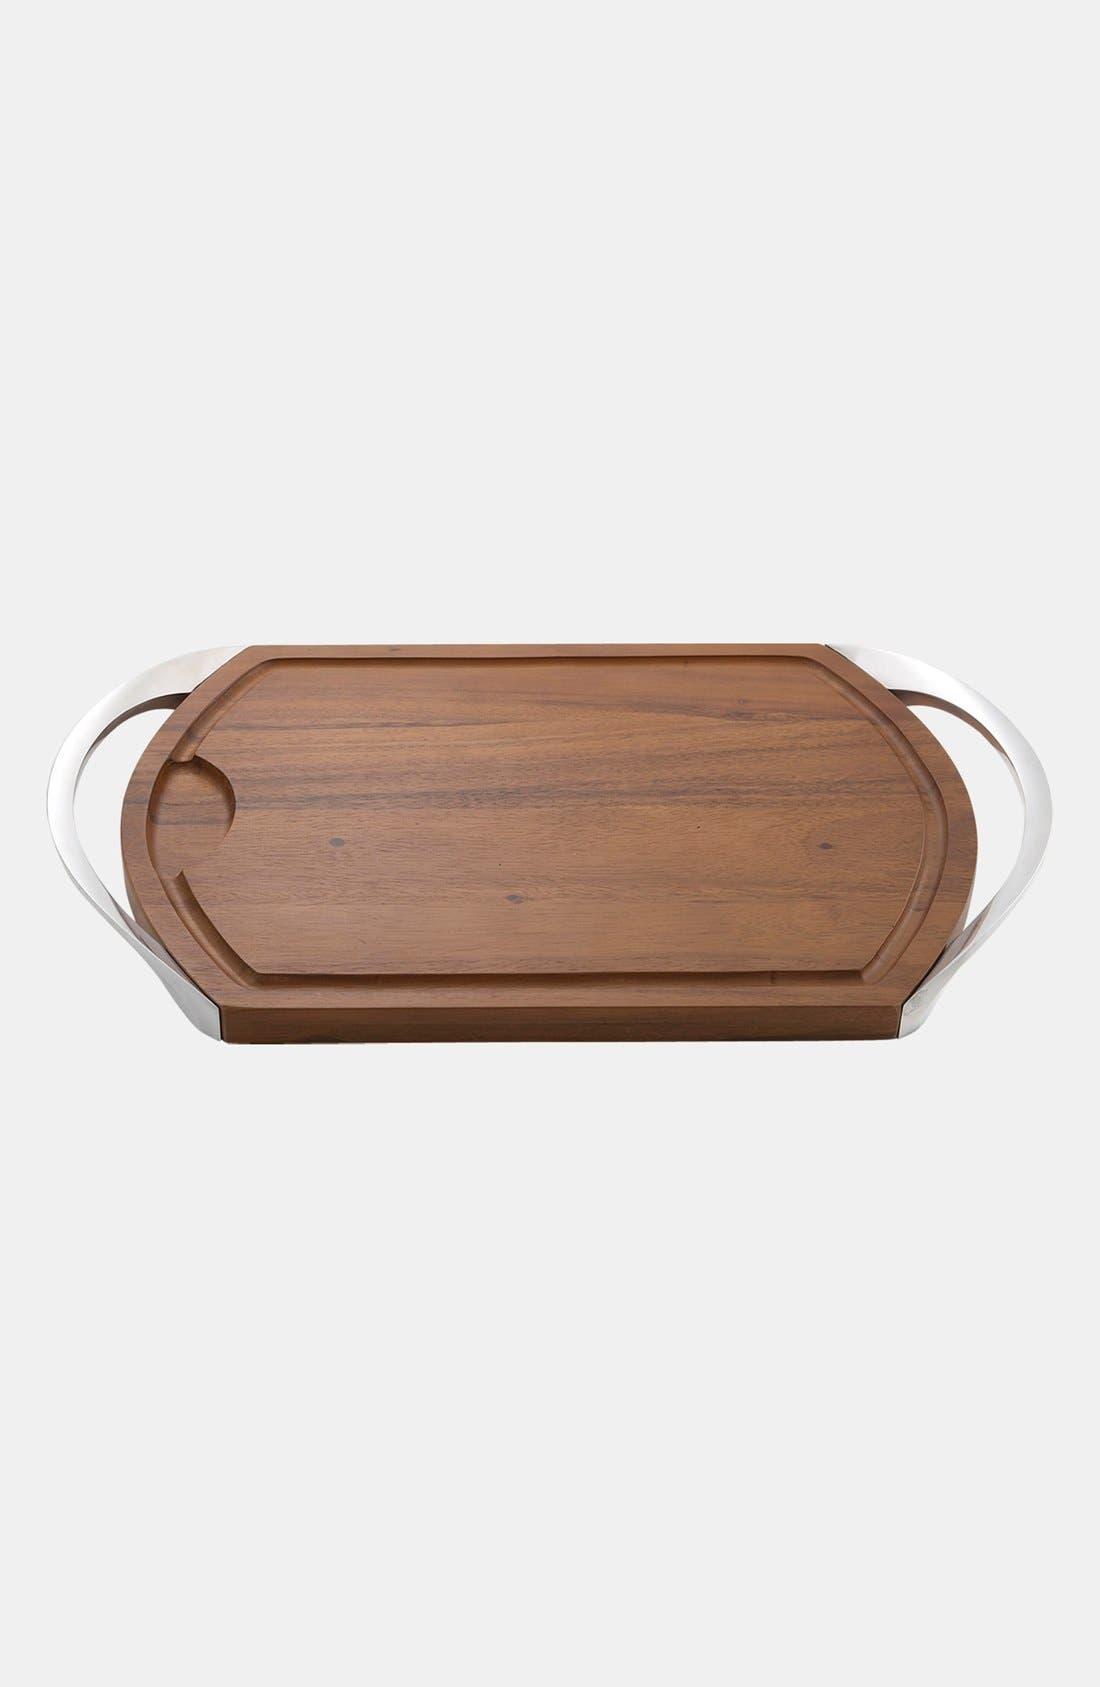 Carve & Serve Cutting Board,                         Main,                         color, Silver